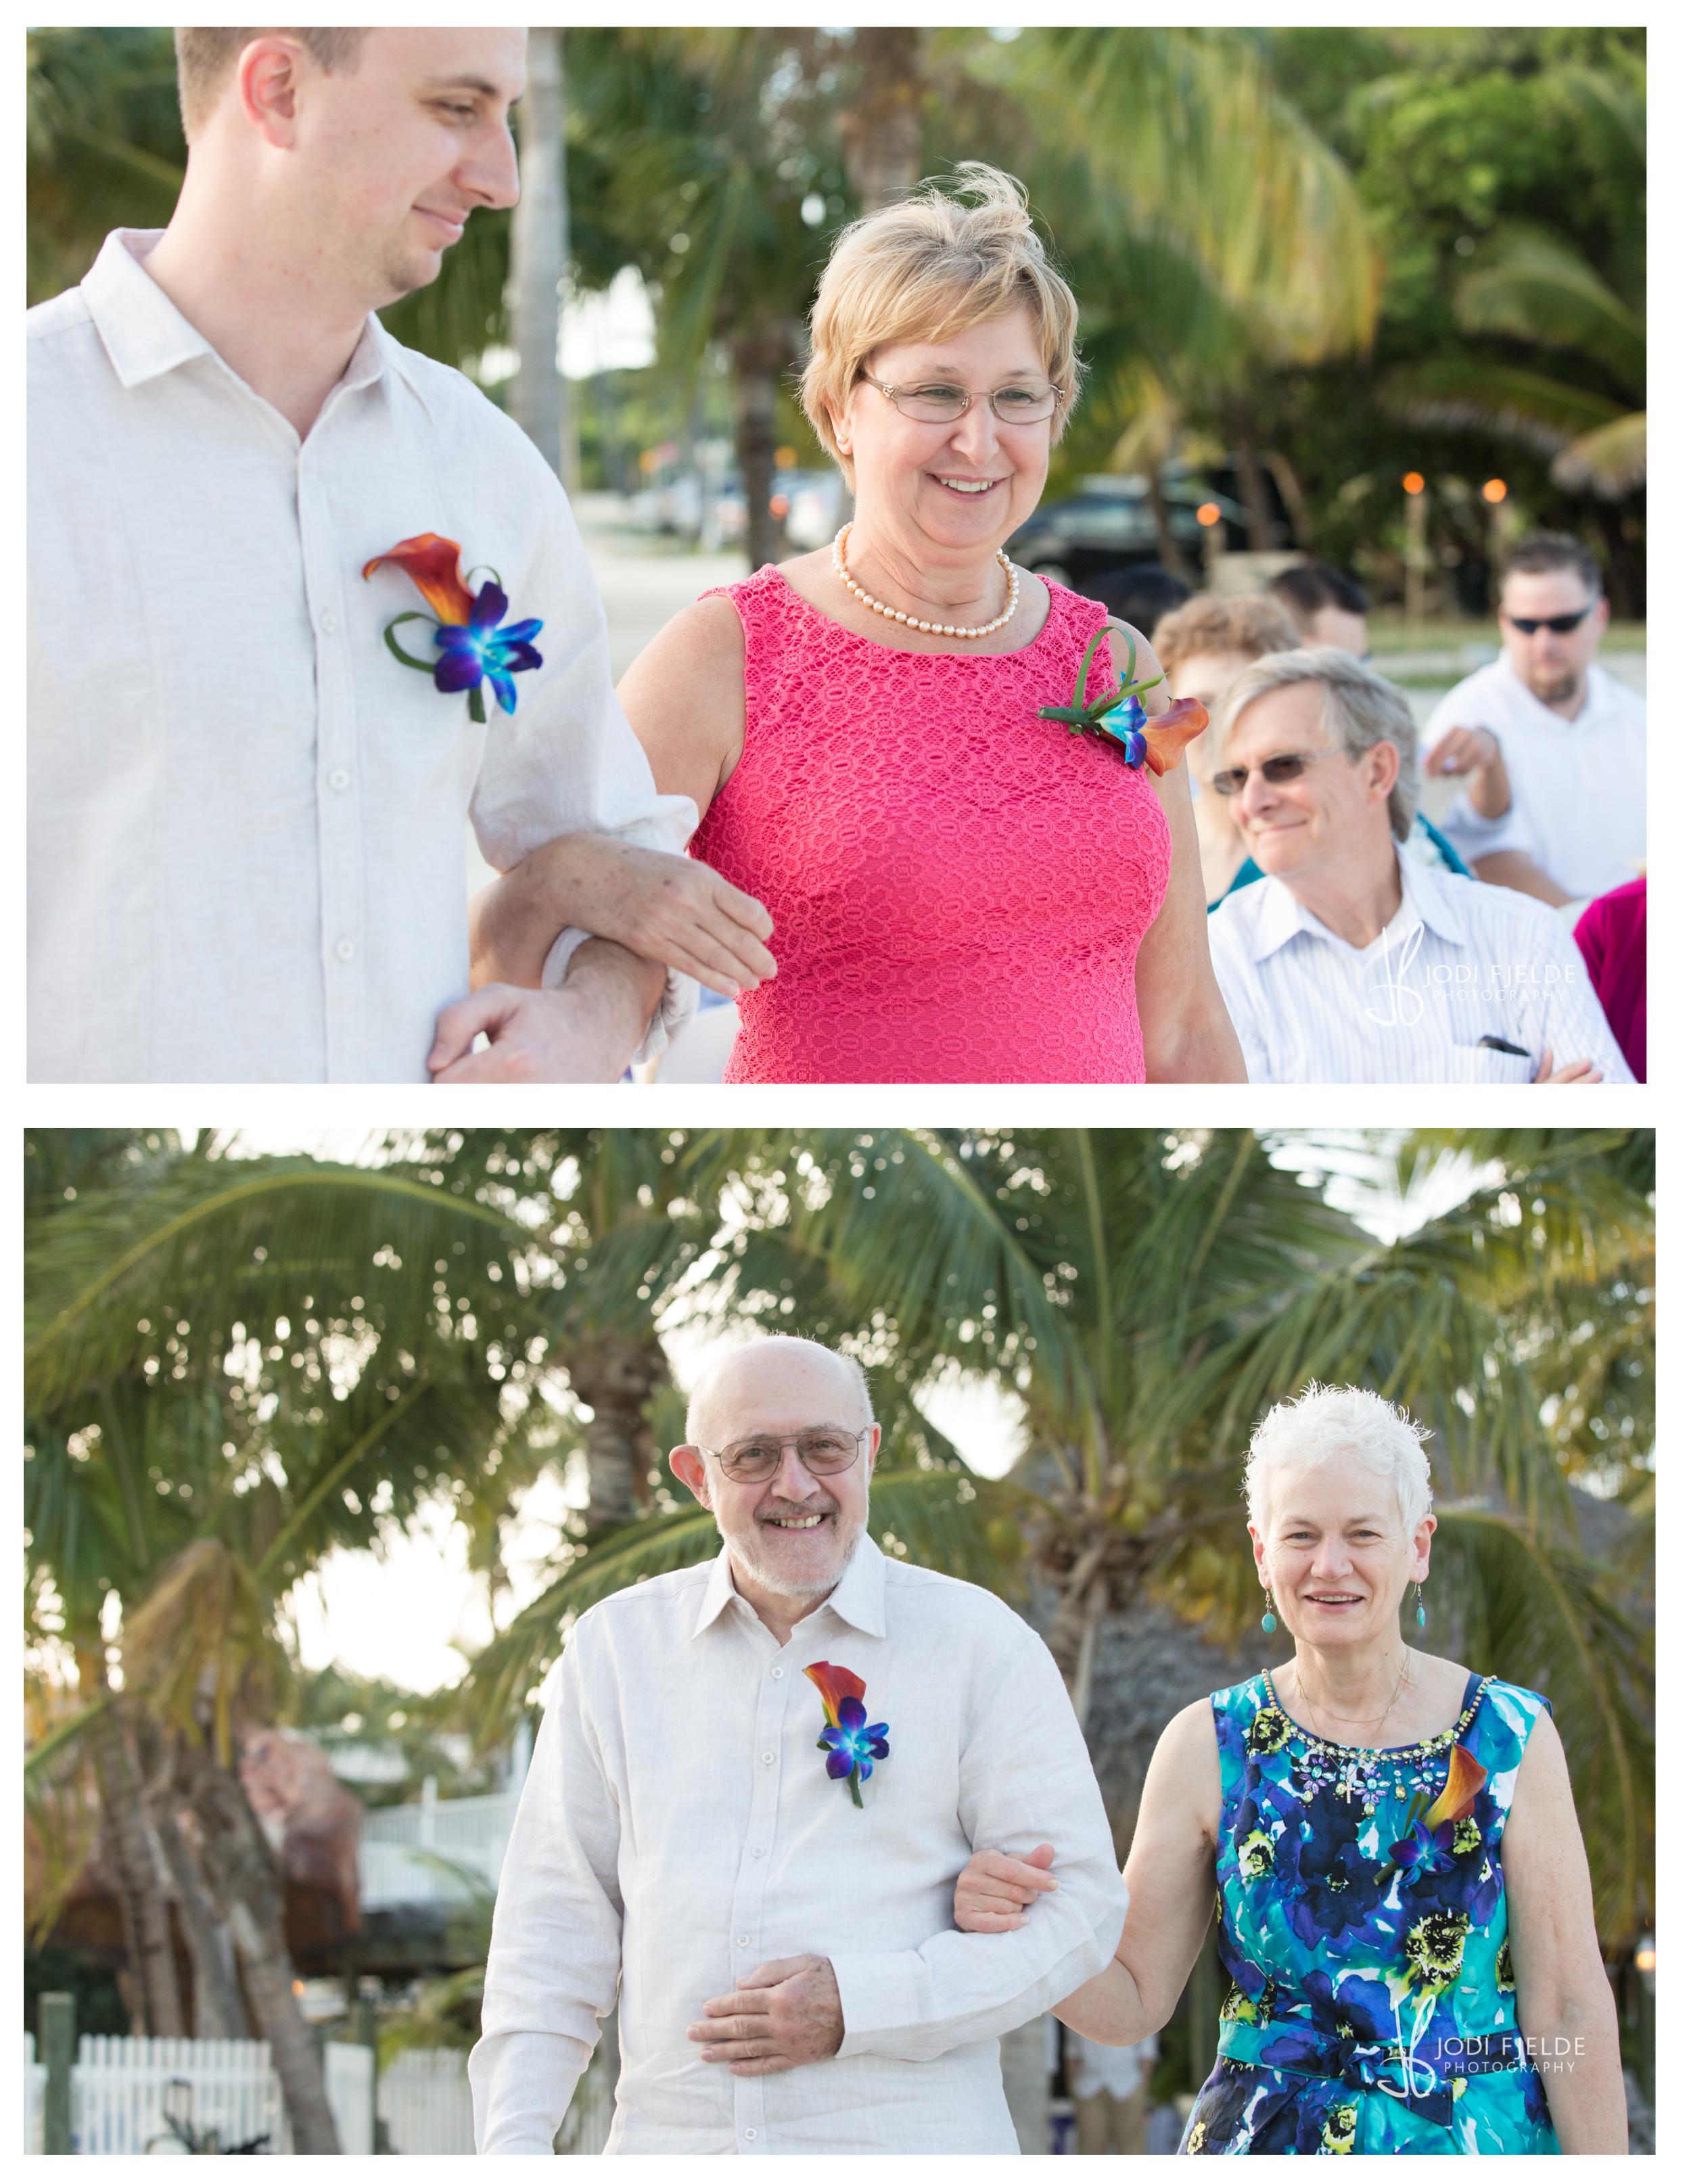 Cocconut_Cove_&_ Marina_ wedding_Kayla_and_Patrick 13.jpg